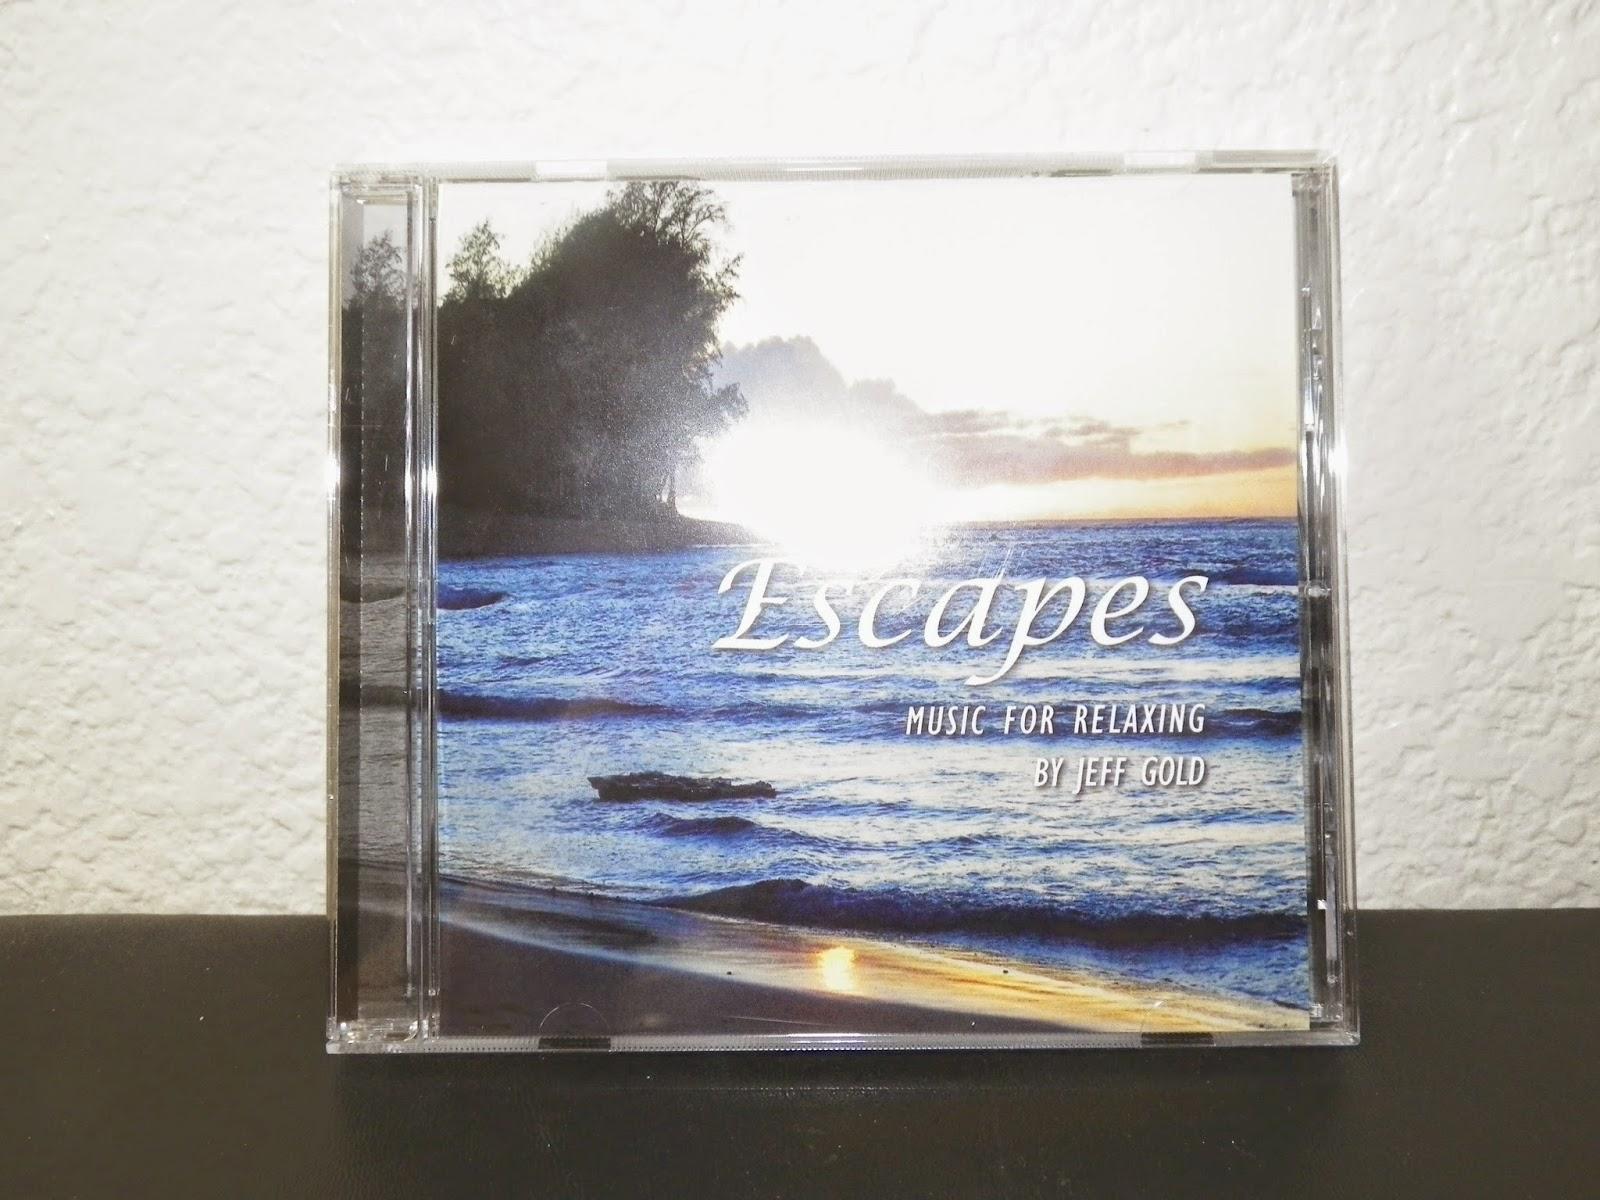 EscapesMusicForRelaxingByJeffGold.jpg